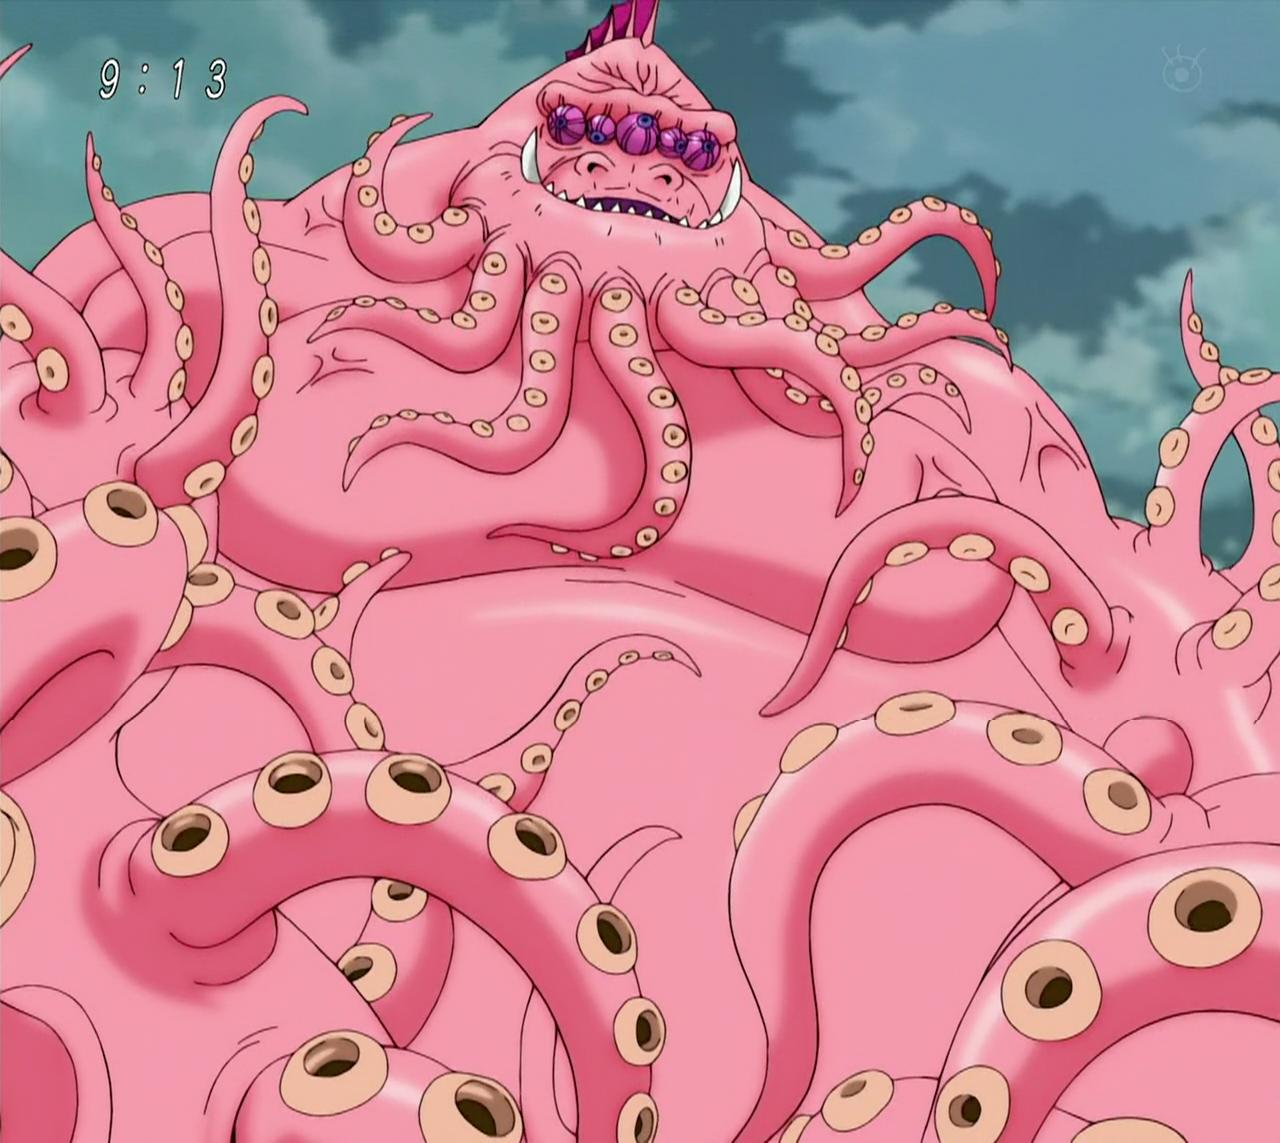 King Octopus Kong